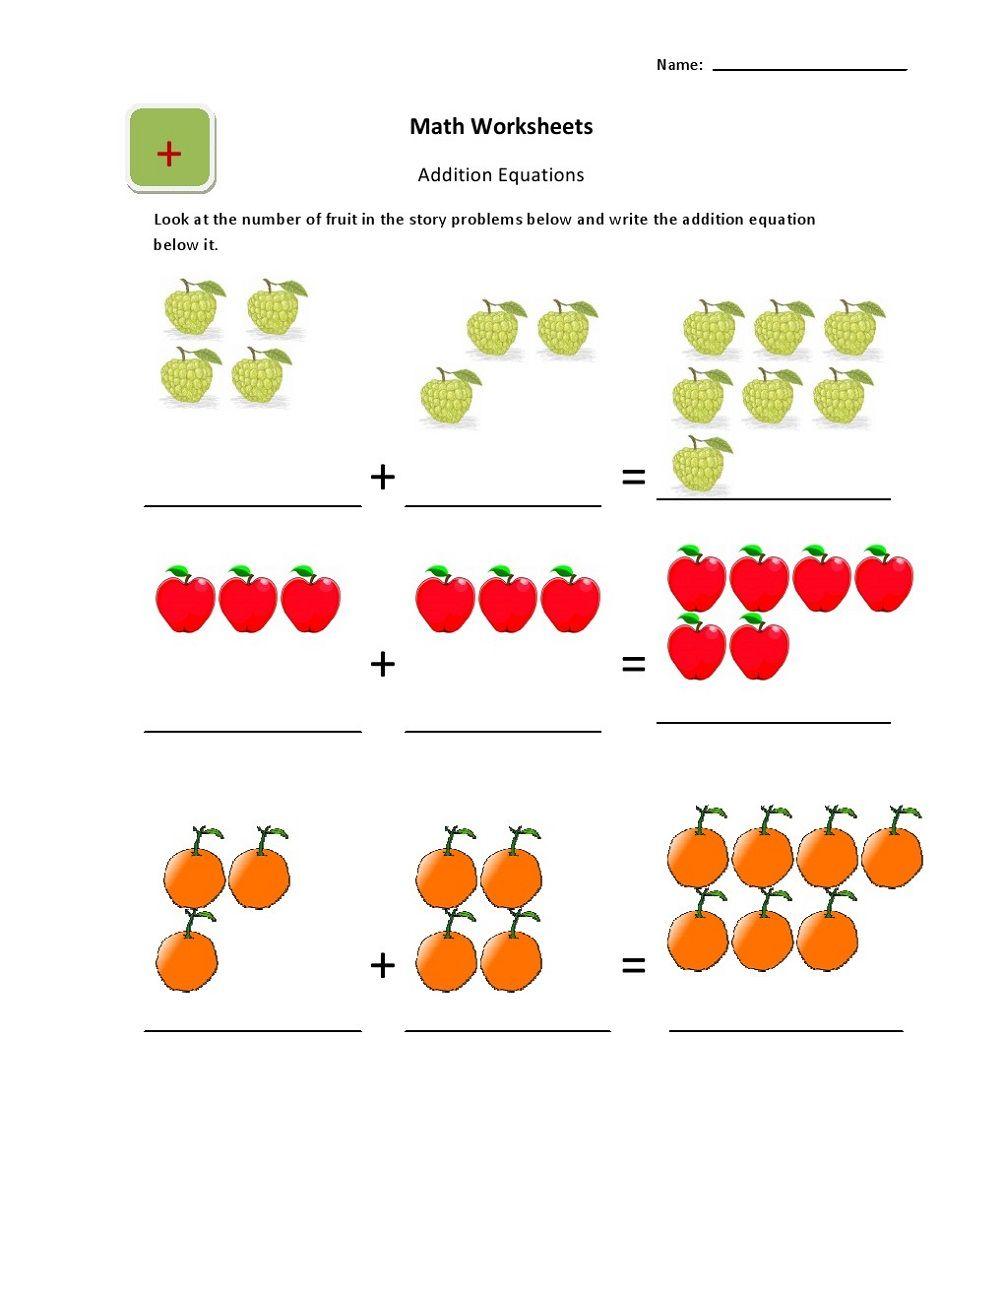 Ukg Worksheets Kindergarten Learning Activities Touch Math Math Worksheets